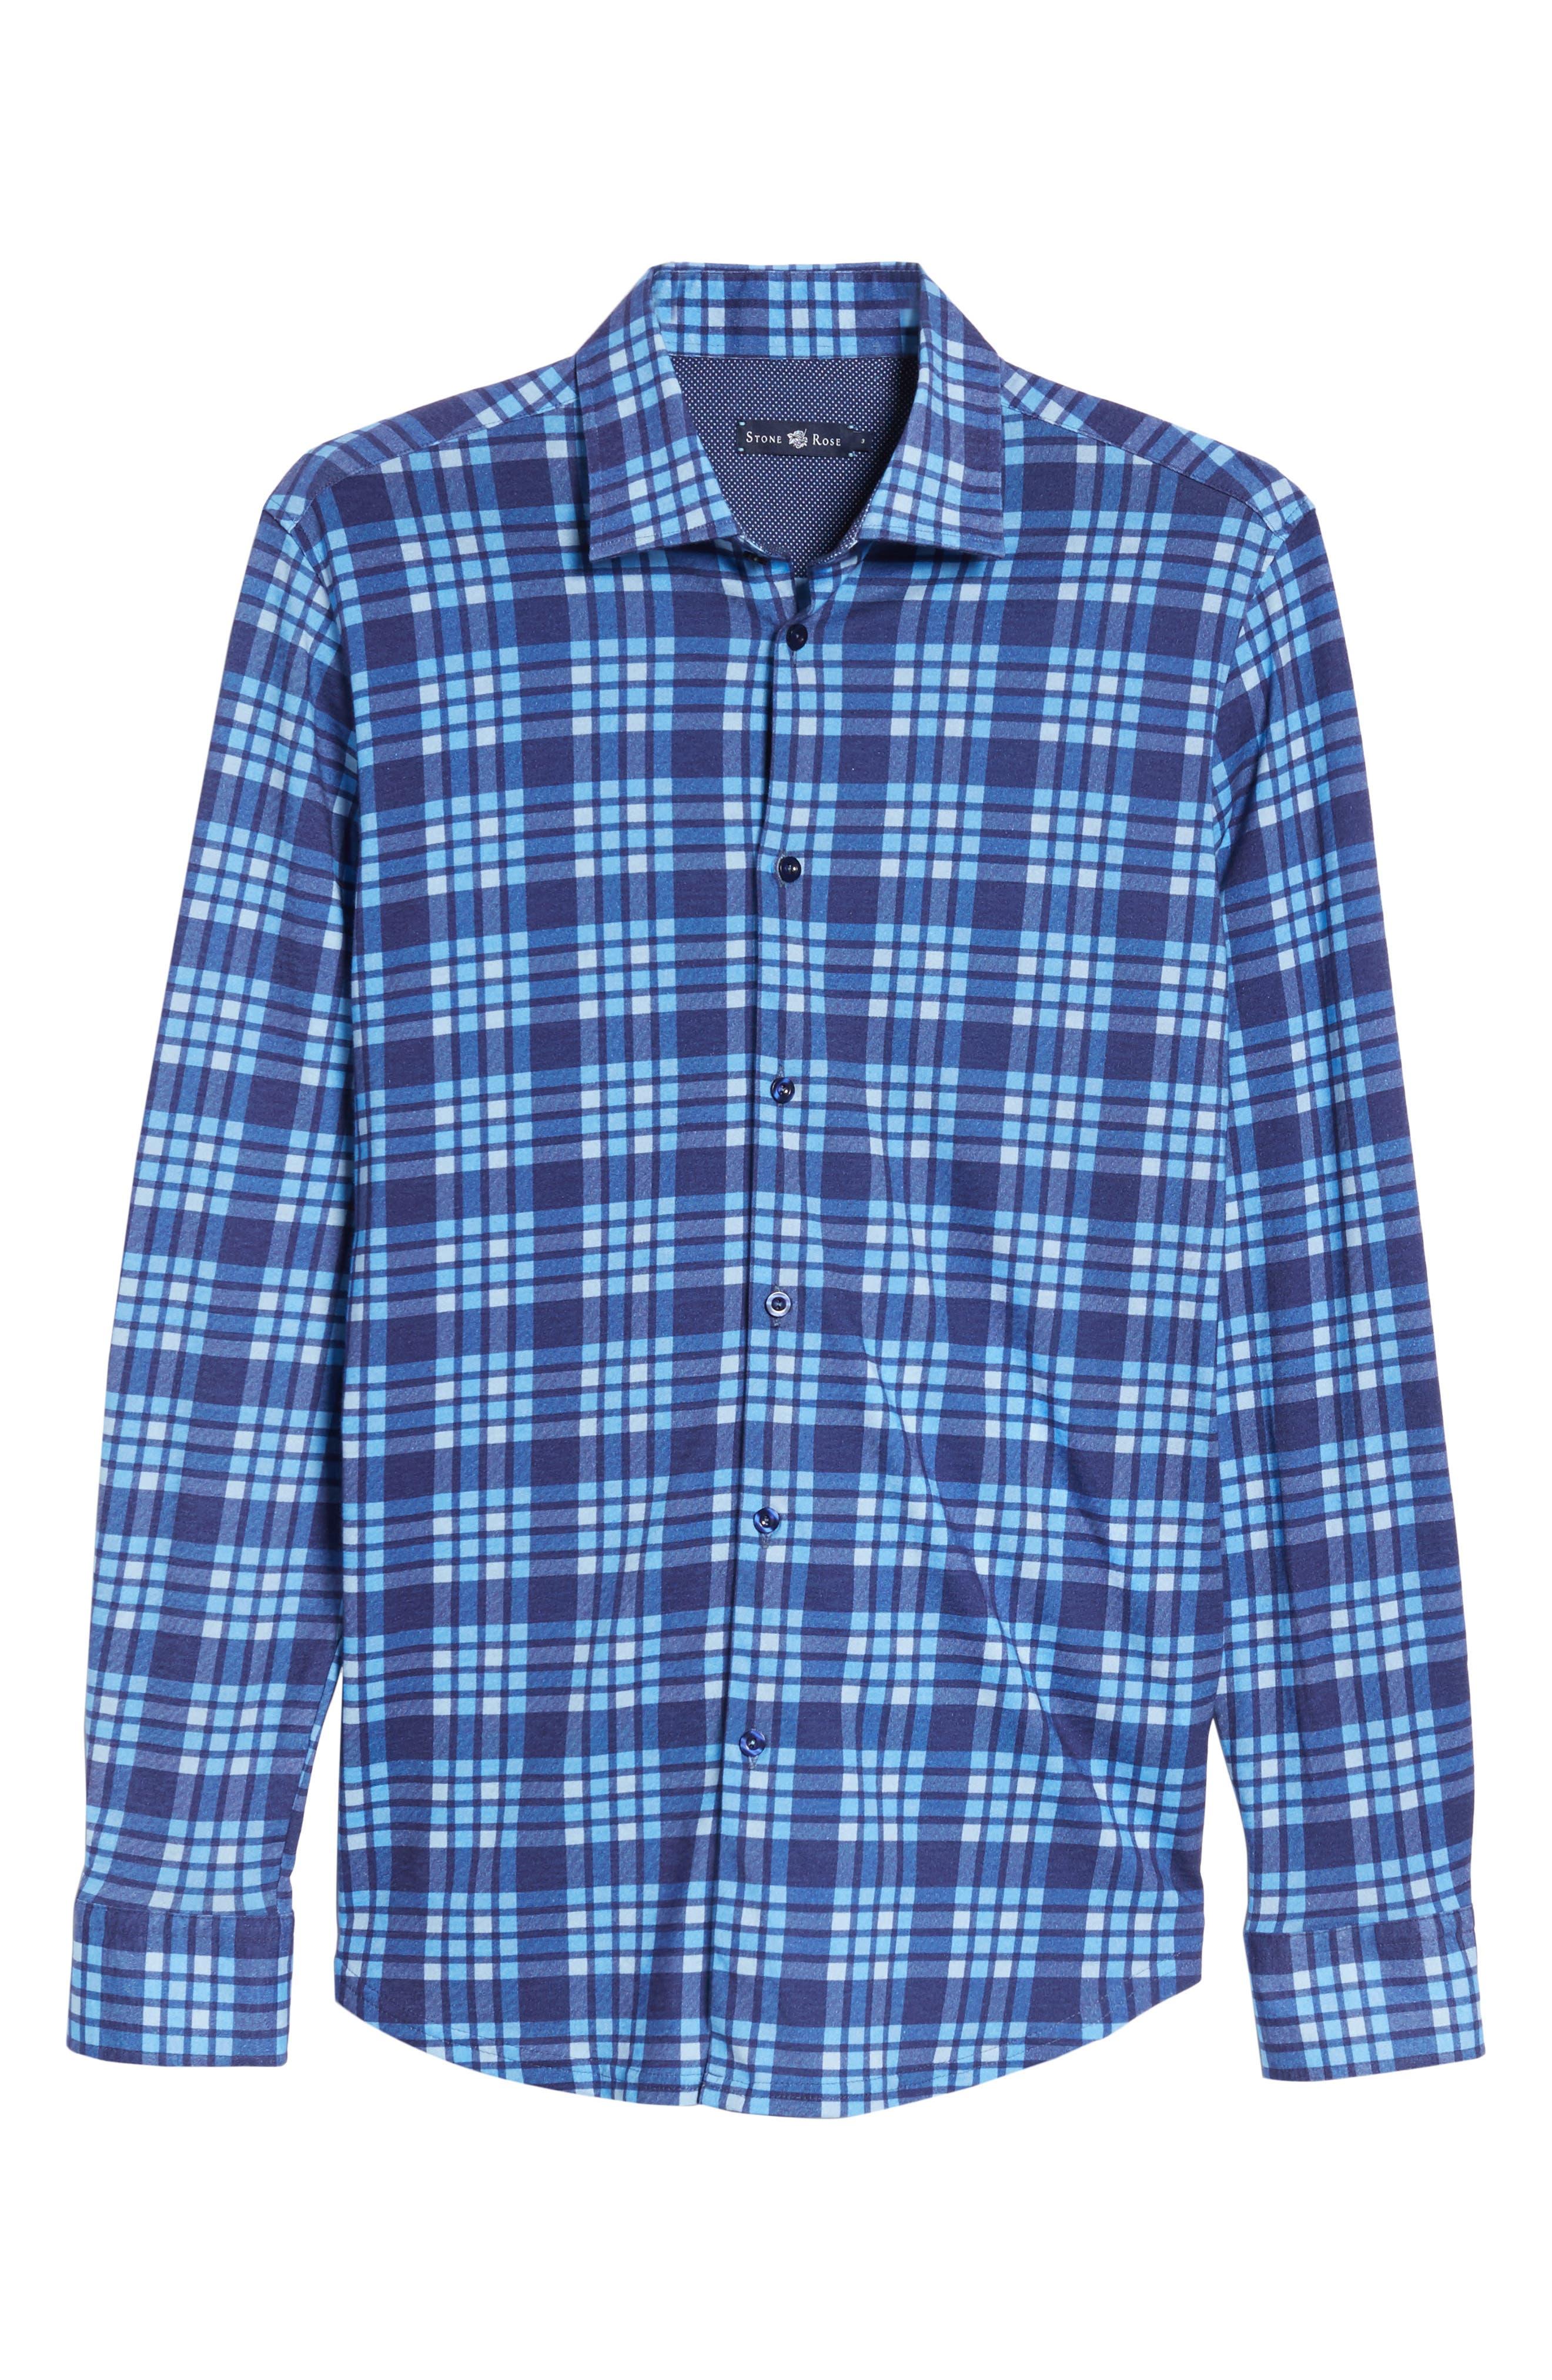 Plaid Print Jersey Shirt,                             Alternate thumbnail 6, color,                             Navy